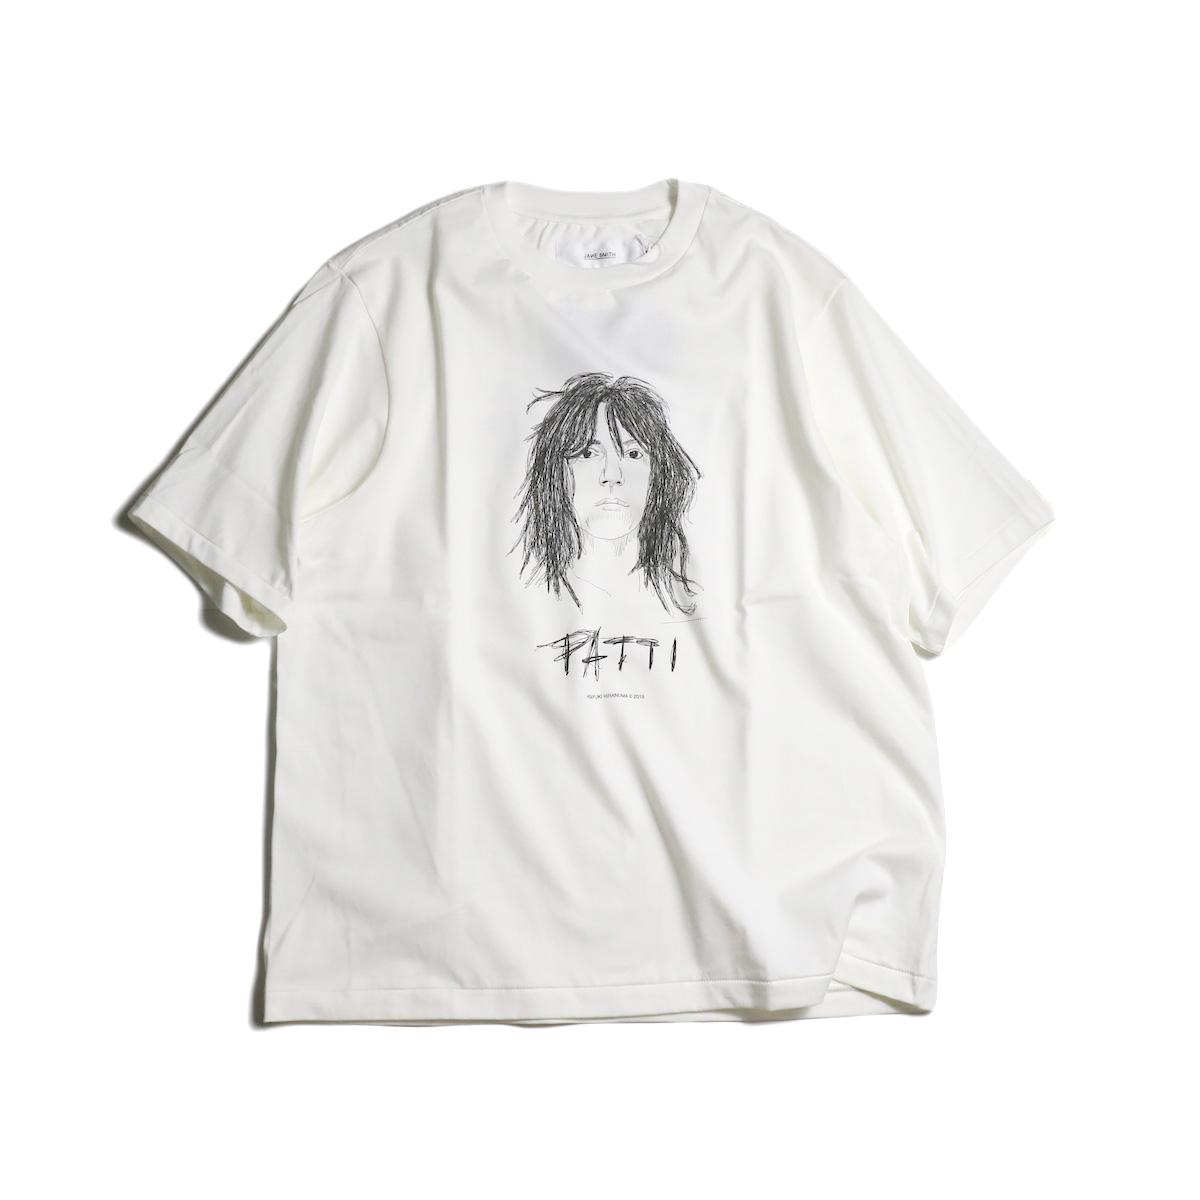 JANE SMITH / PATTI S/S Tee 正面